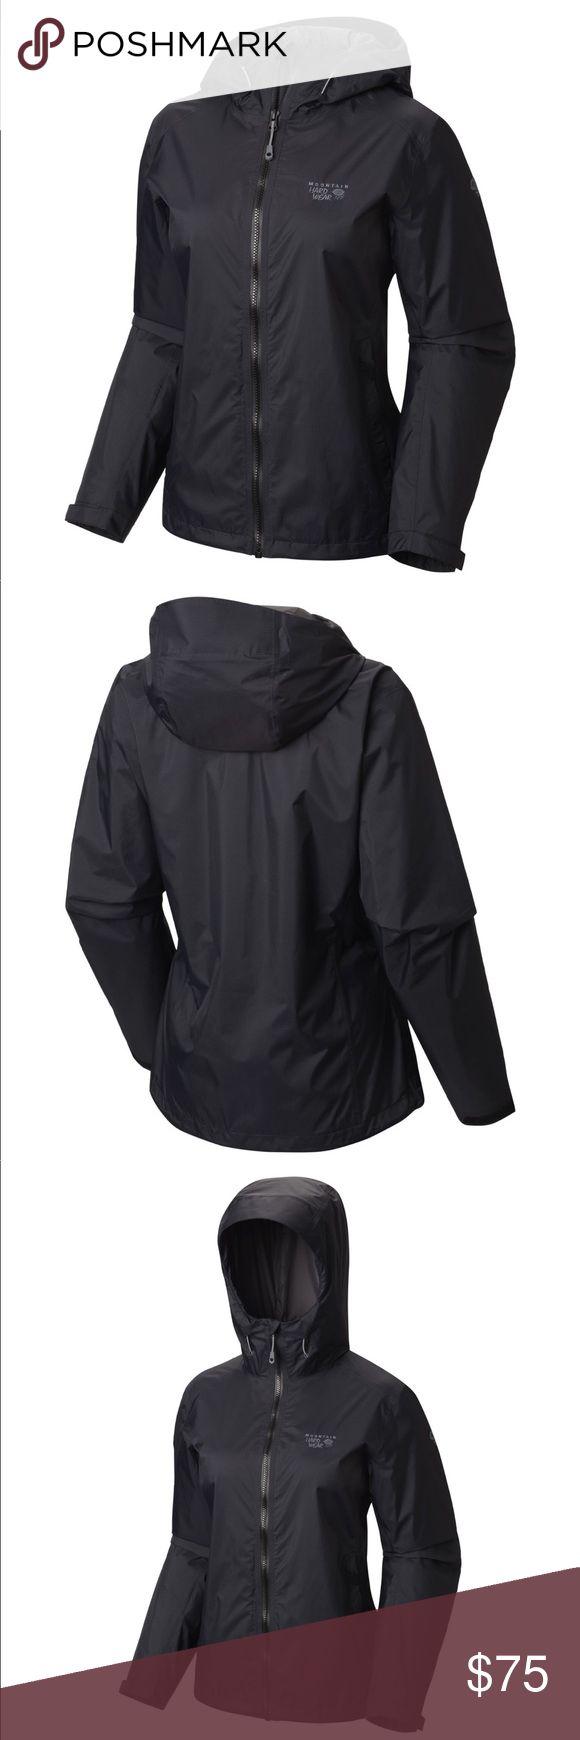 Mountain hardwear rain jacket with hood Like new , never worn No trades please Mountain Hardwear Jackets & Coats